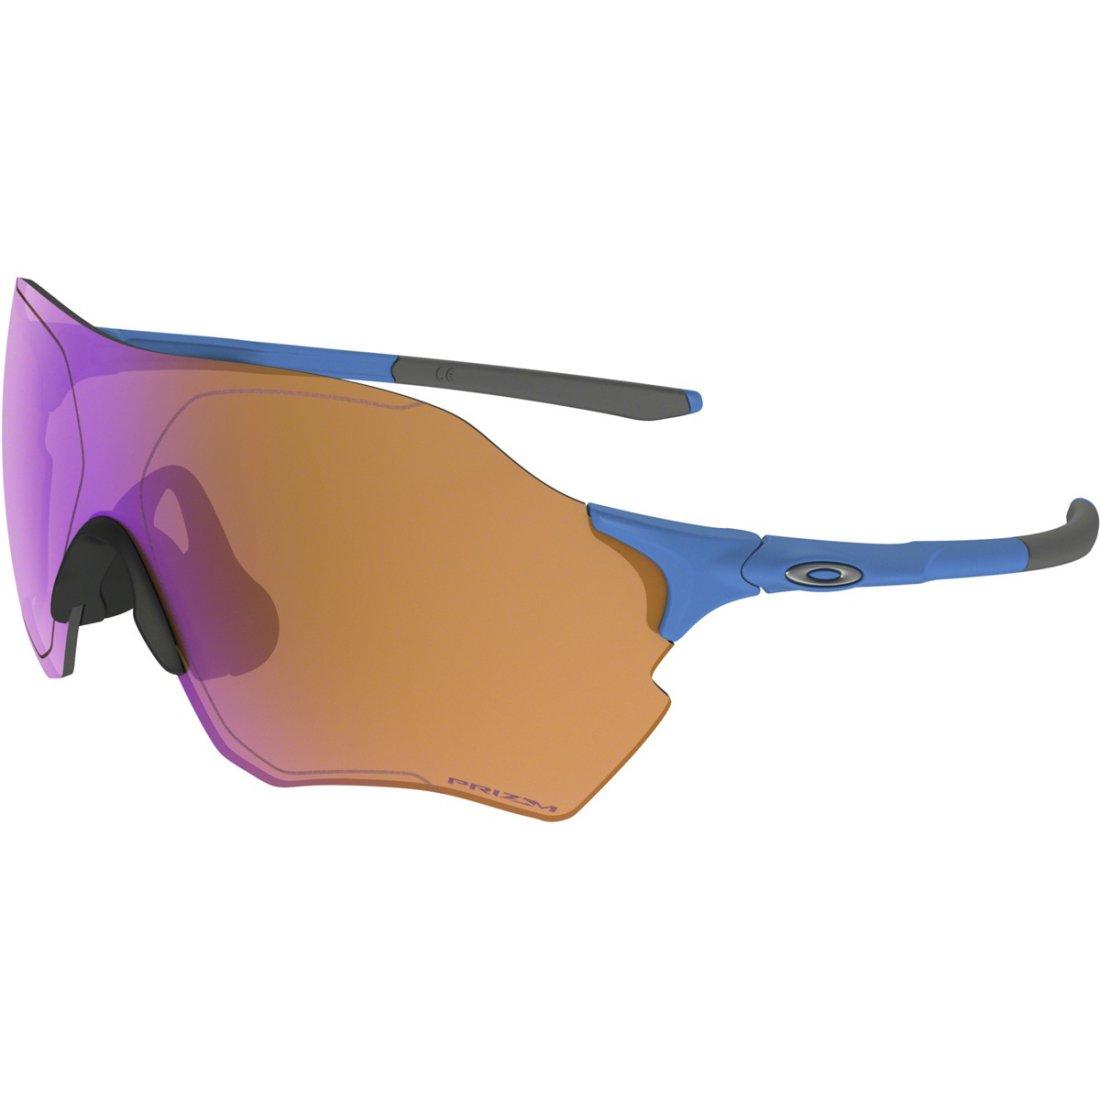 88121be525 OAKLEY EVZero Ranger Matte Sky Blue   Prizm Trail Mask   Goggle · Motocard